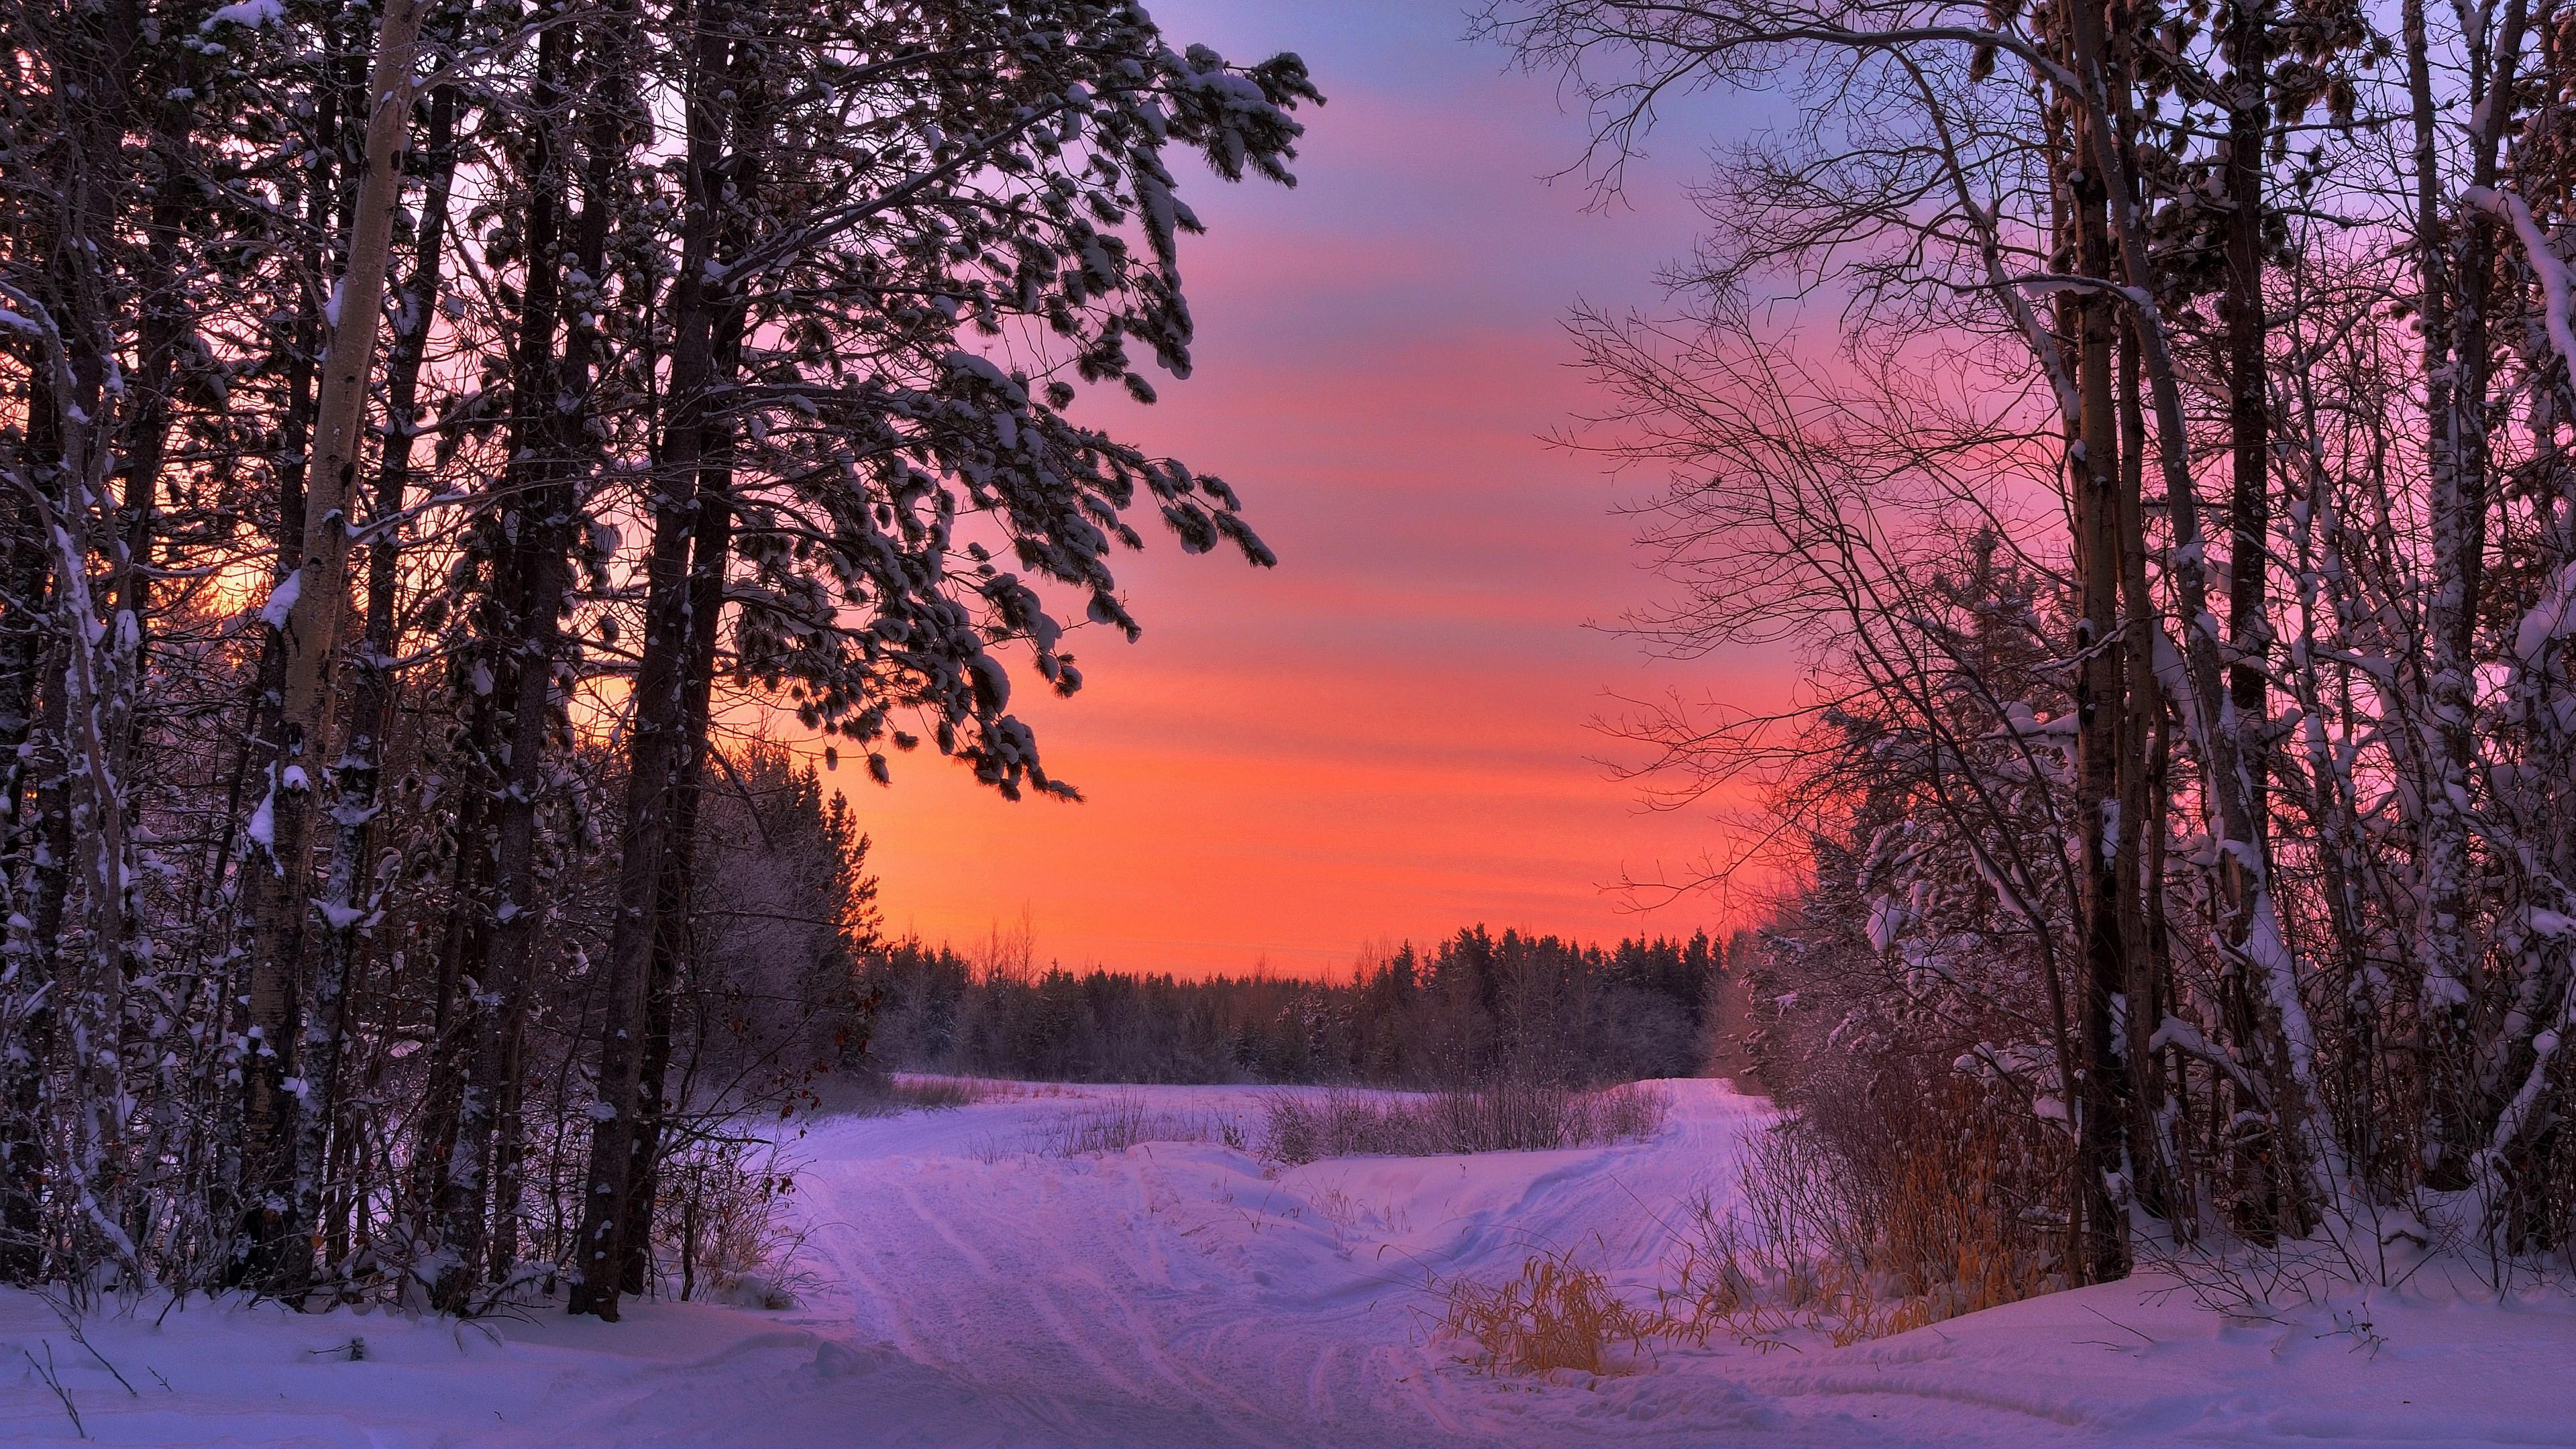 High Resolution Winter Scenes